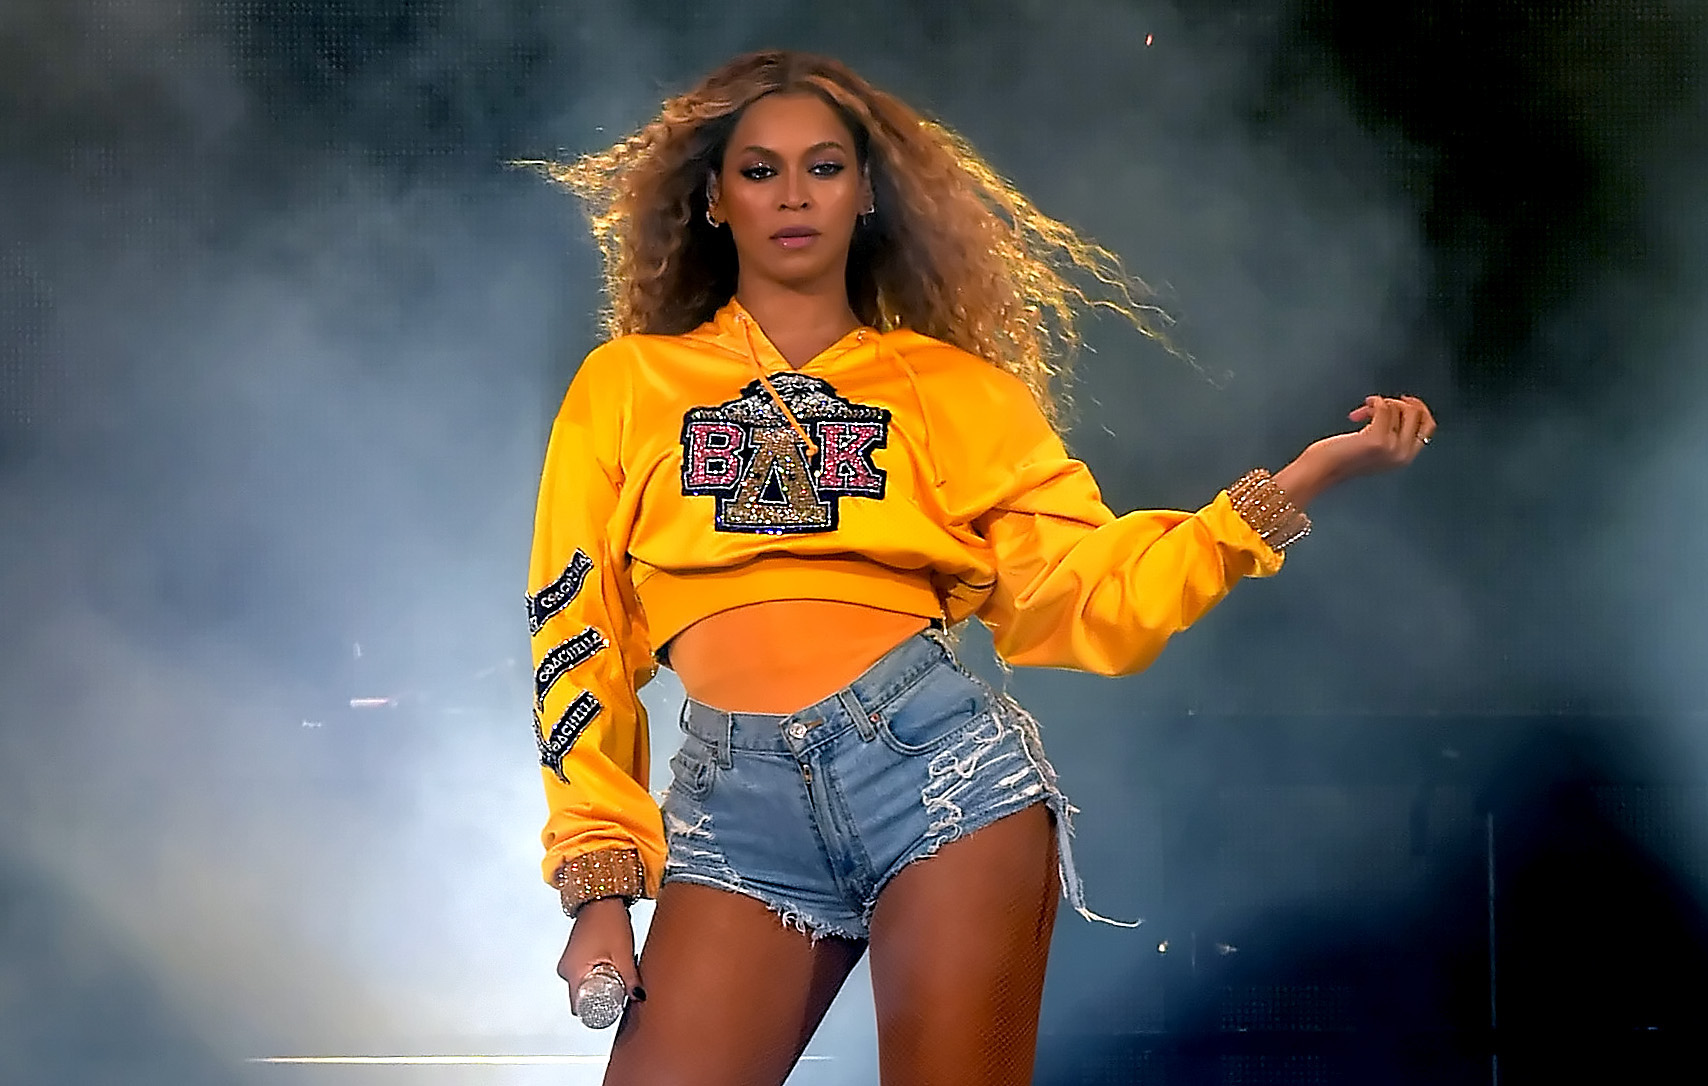 Il nuovo film di Beyoncé su Netflix